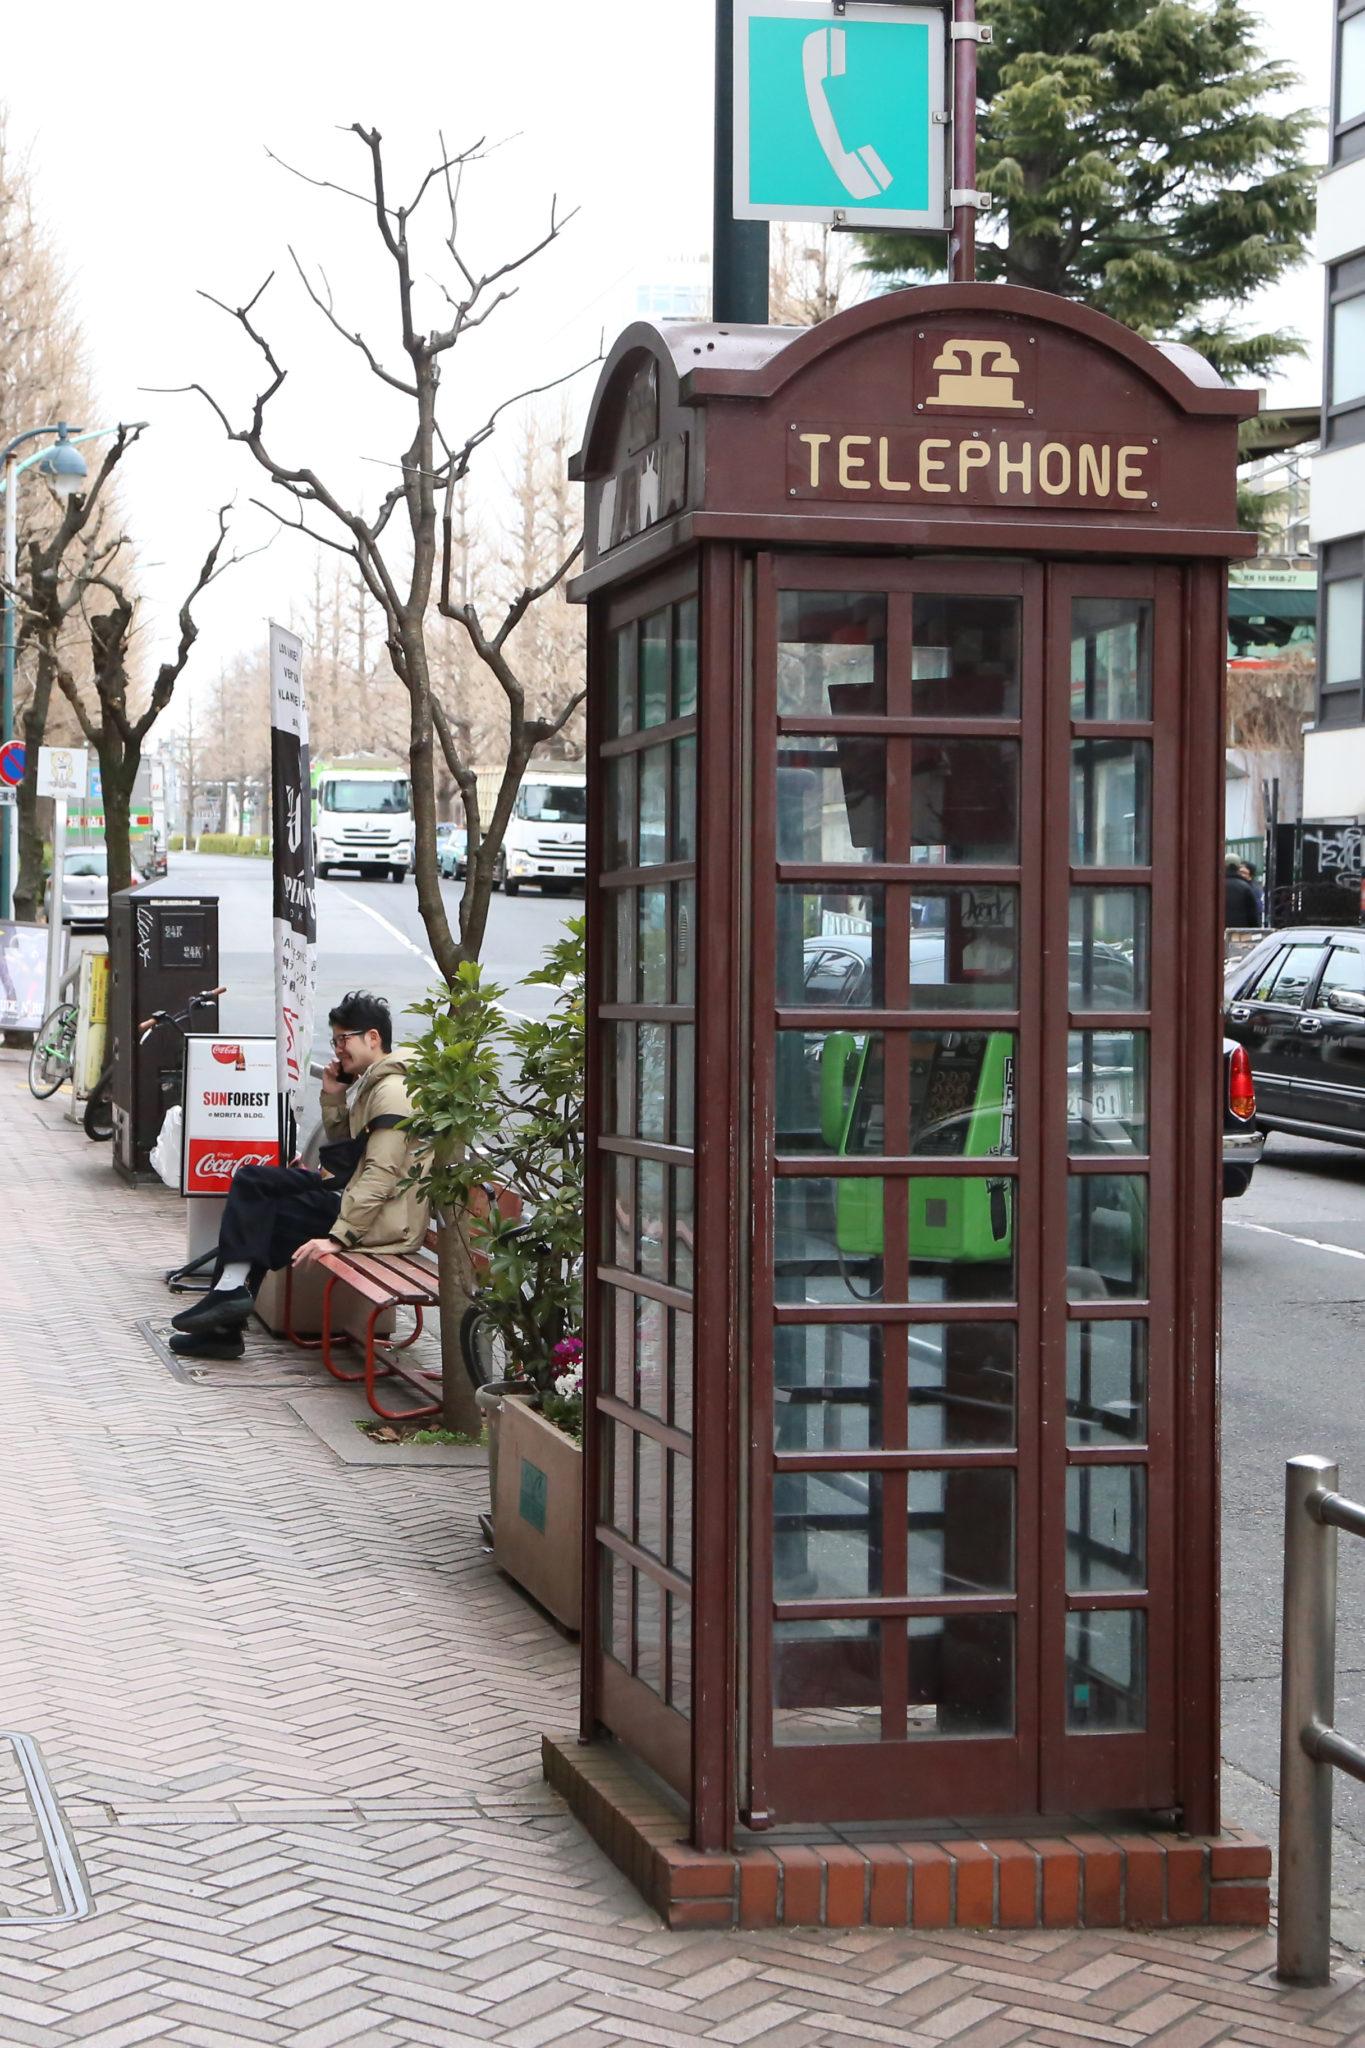 Cabina telefonica in Giappone